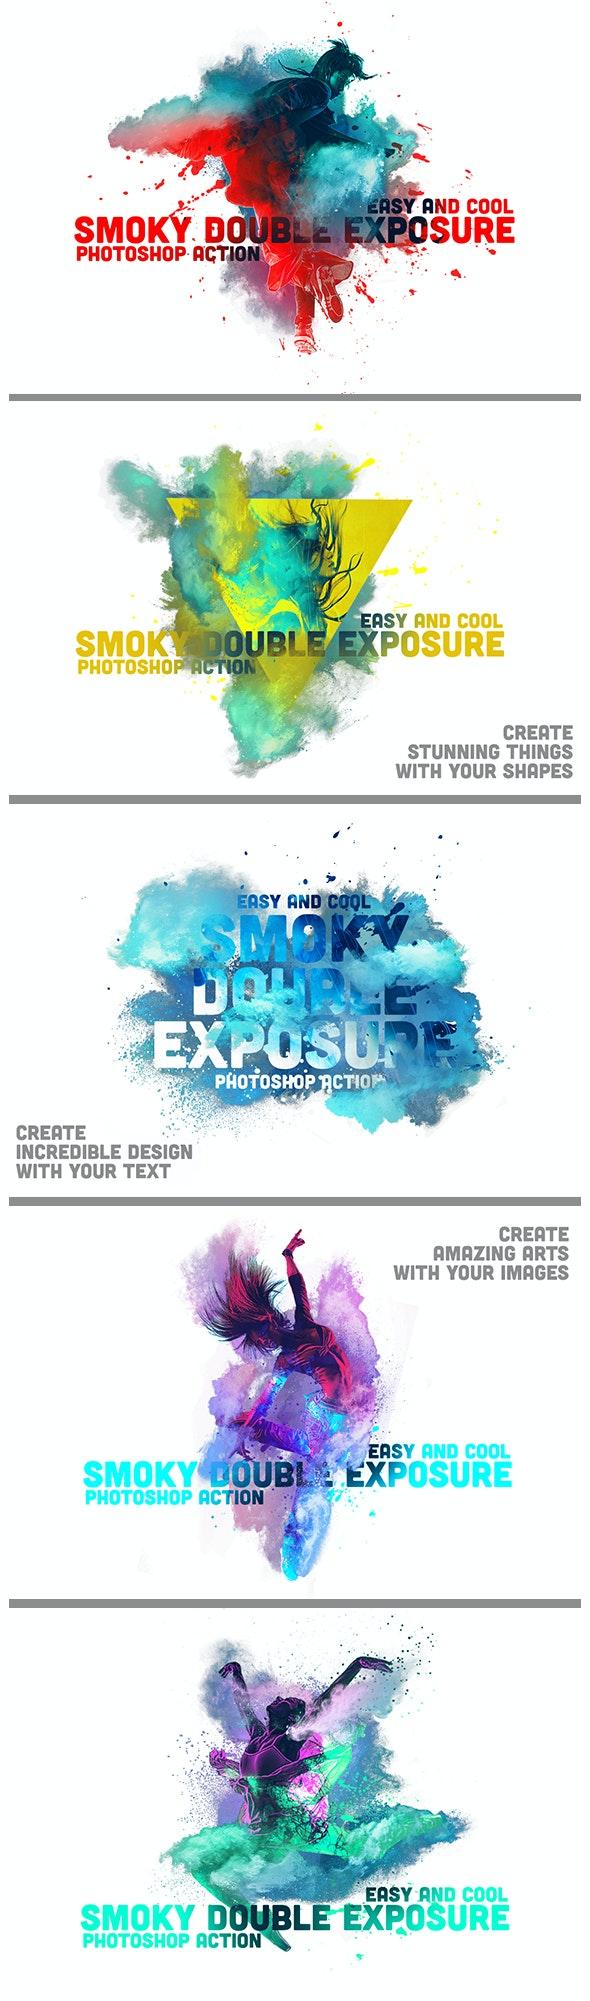 Smoky Double Exposure - Actions Photoshop